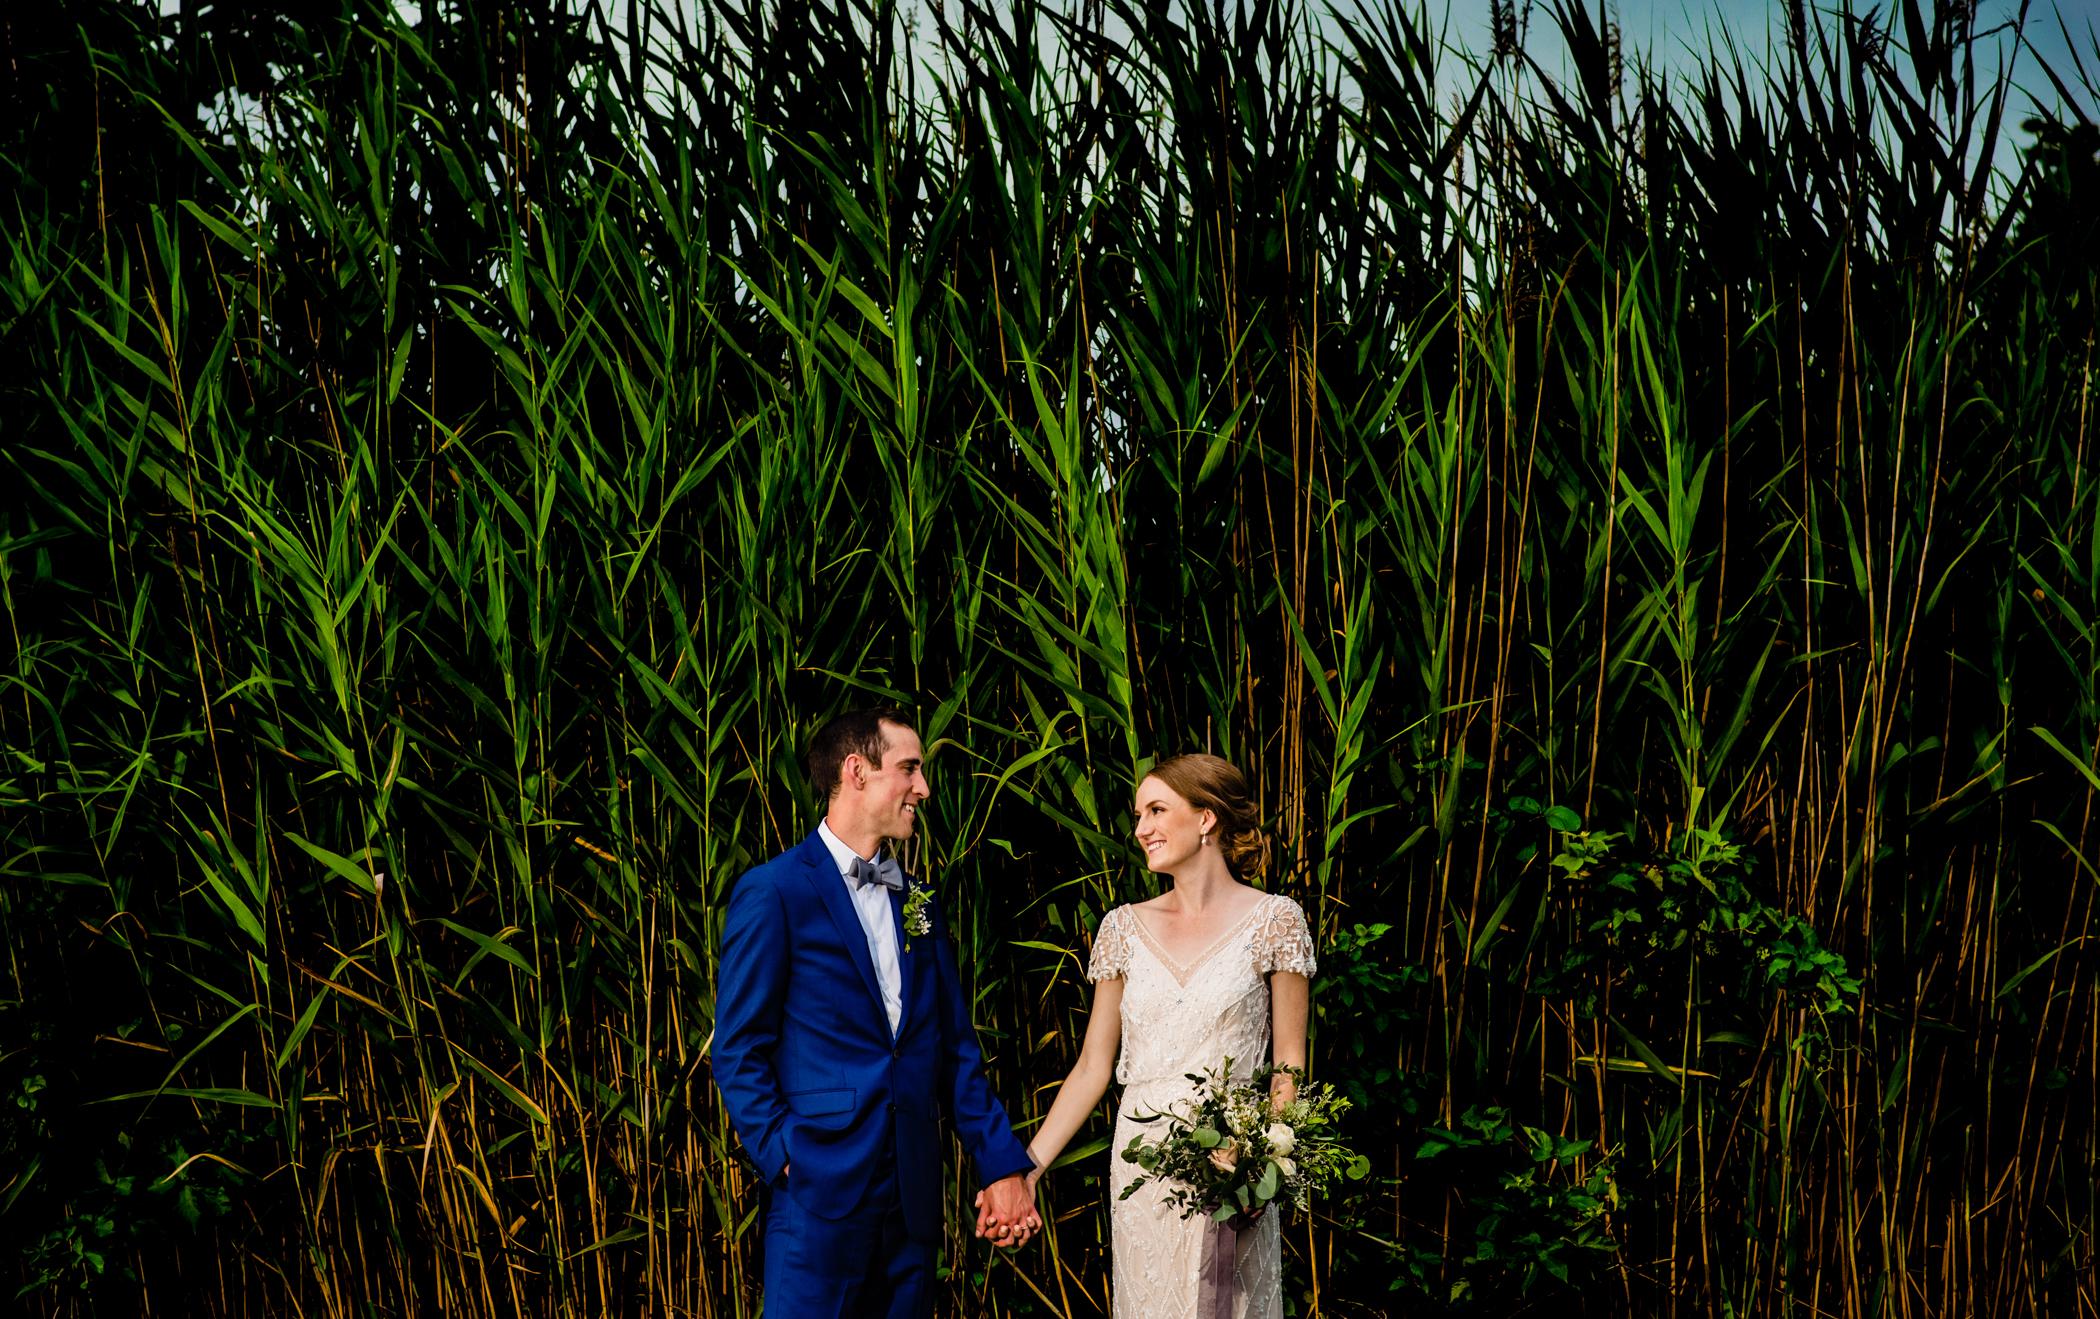 ri-artistic-wedding-photographer-chris-nachtwey-2018-1.jpg